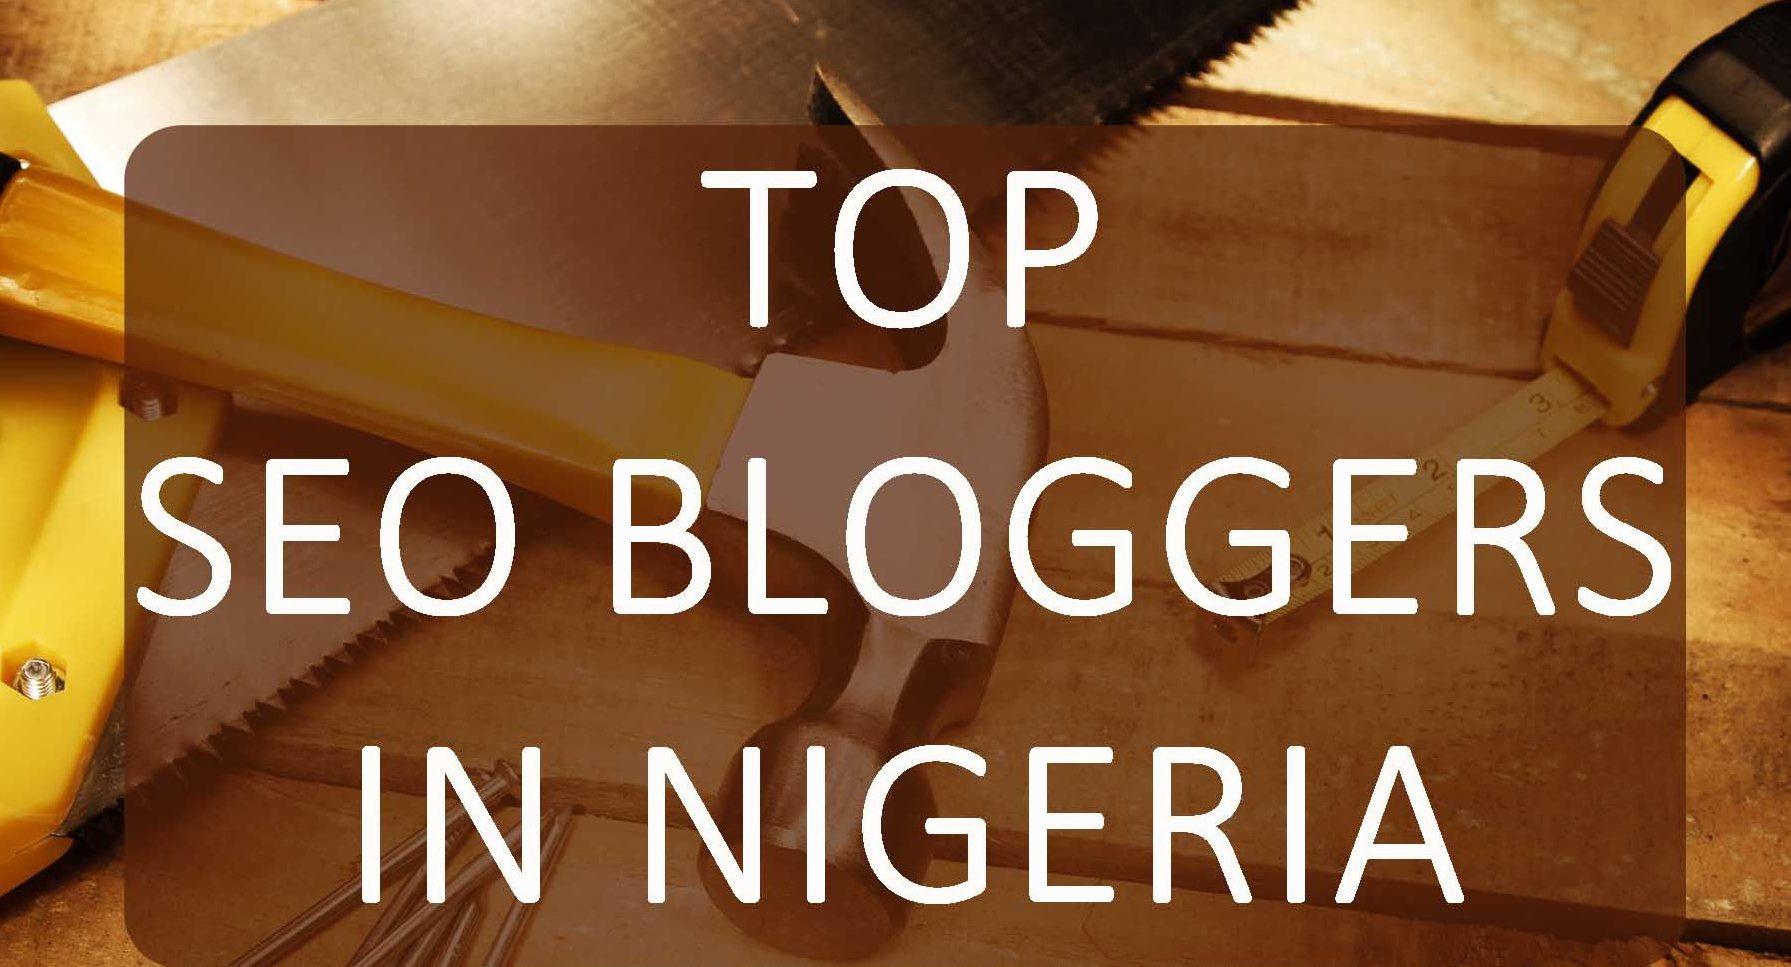 Top bloggers in nigeria 2017